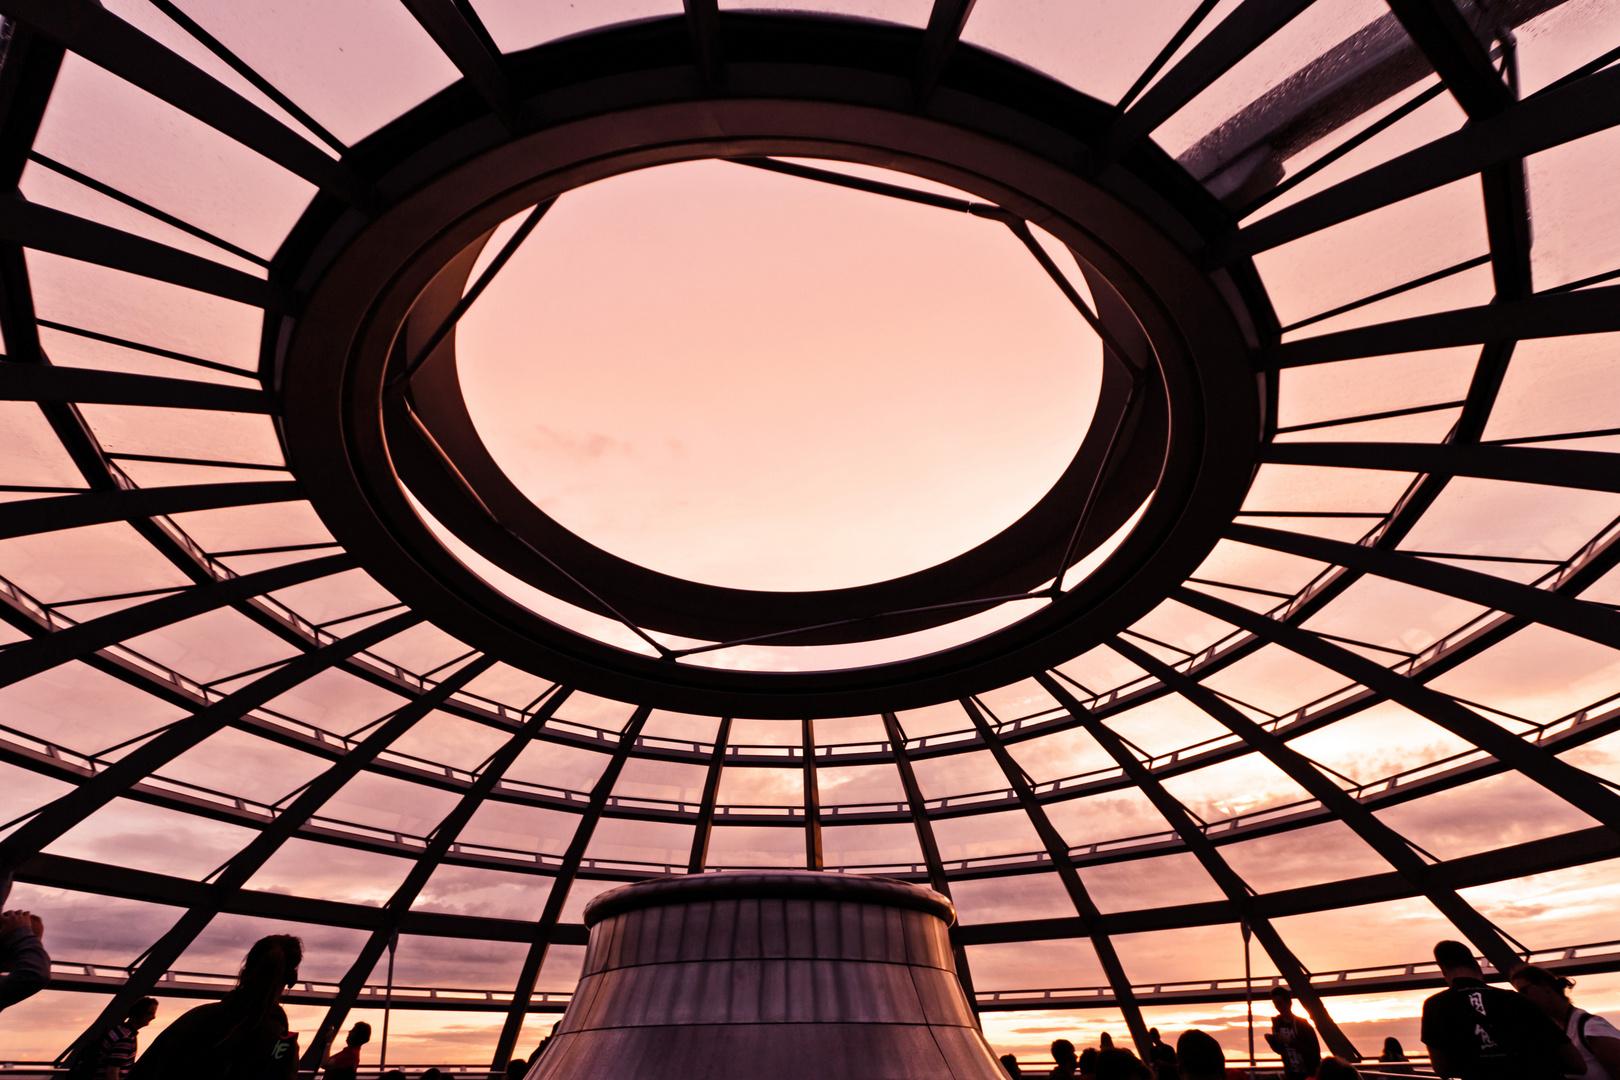 Kuppel bei Sonnenuntergang